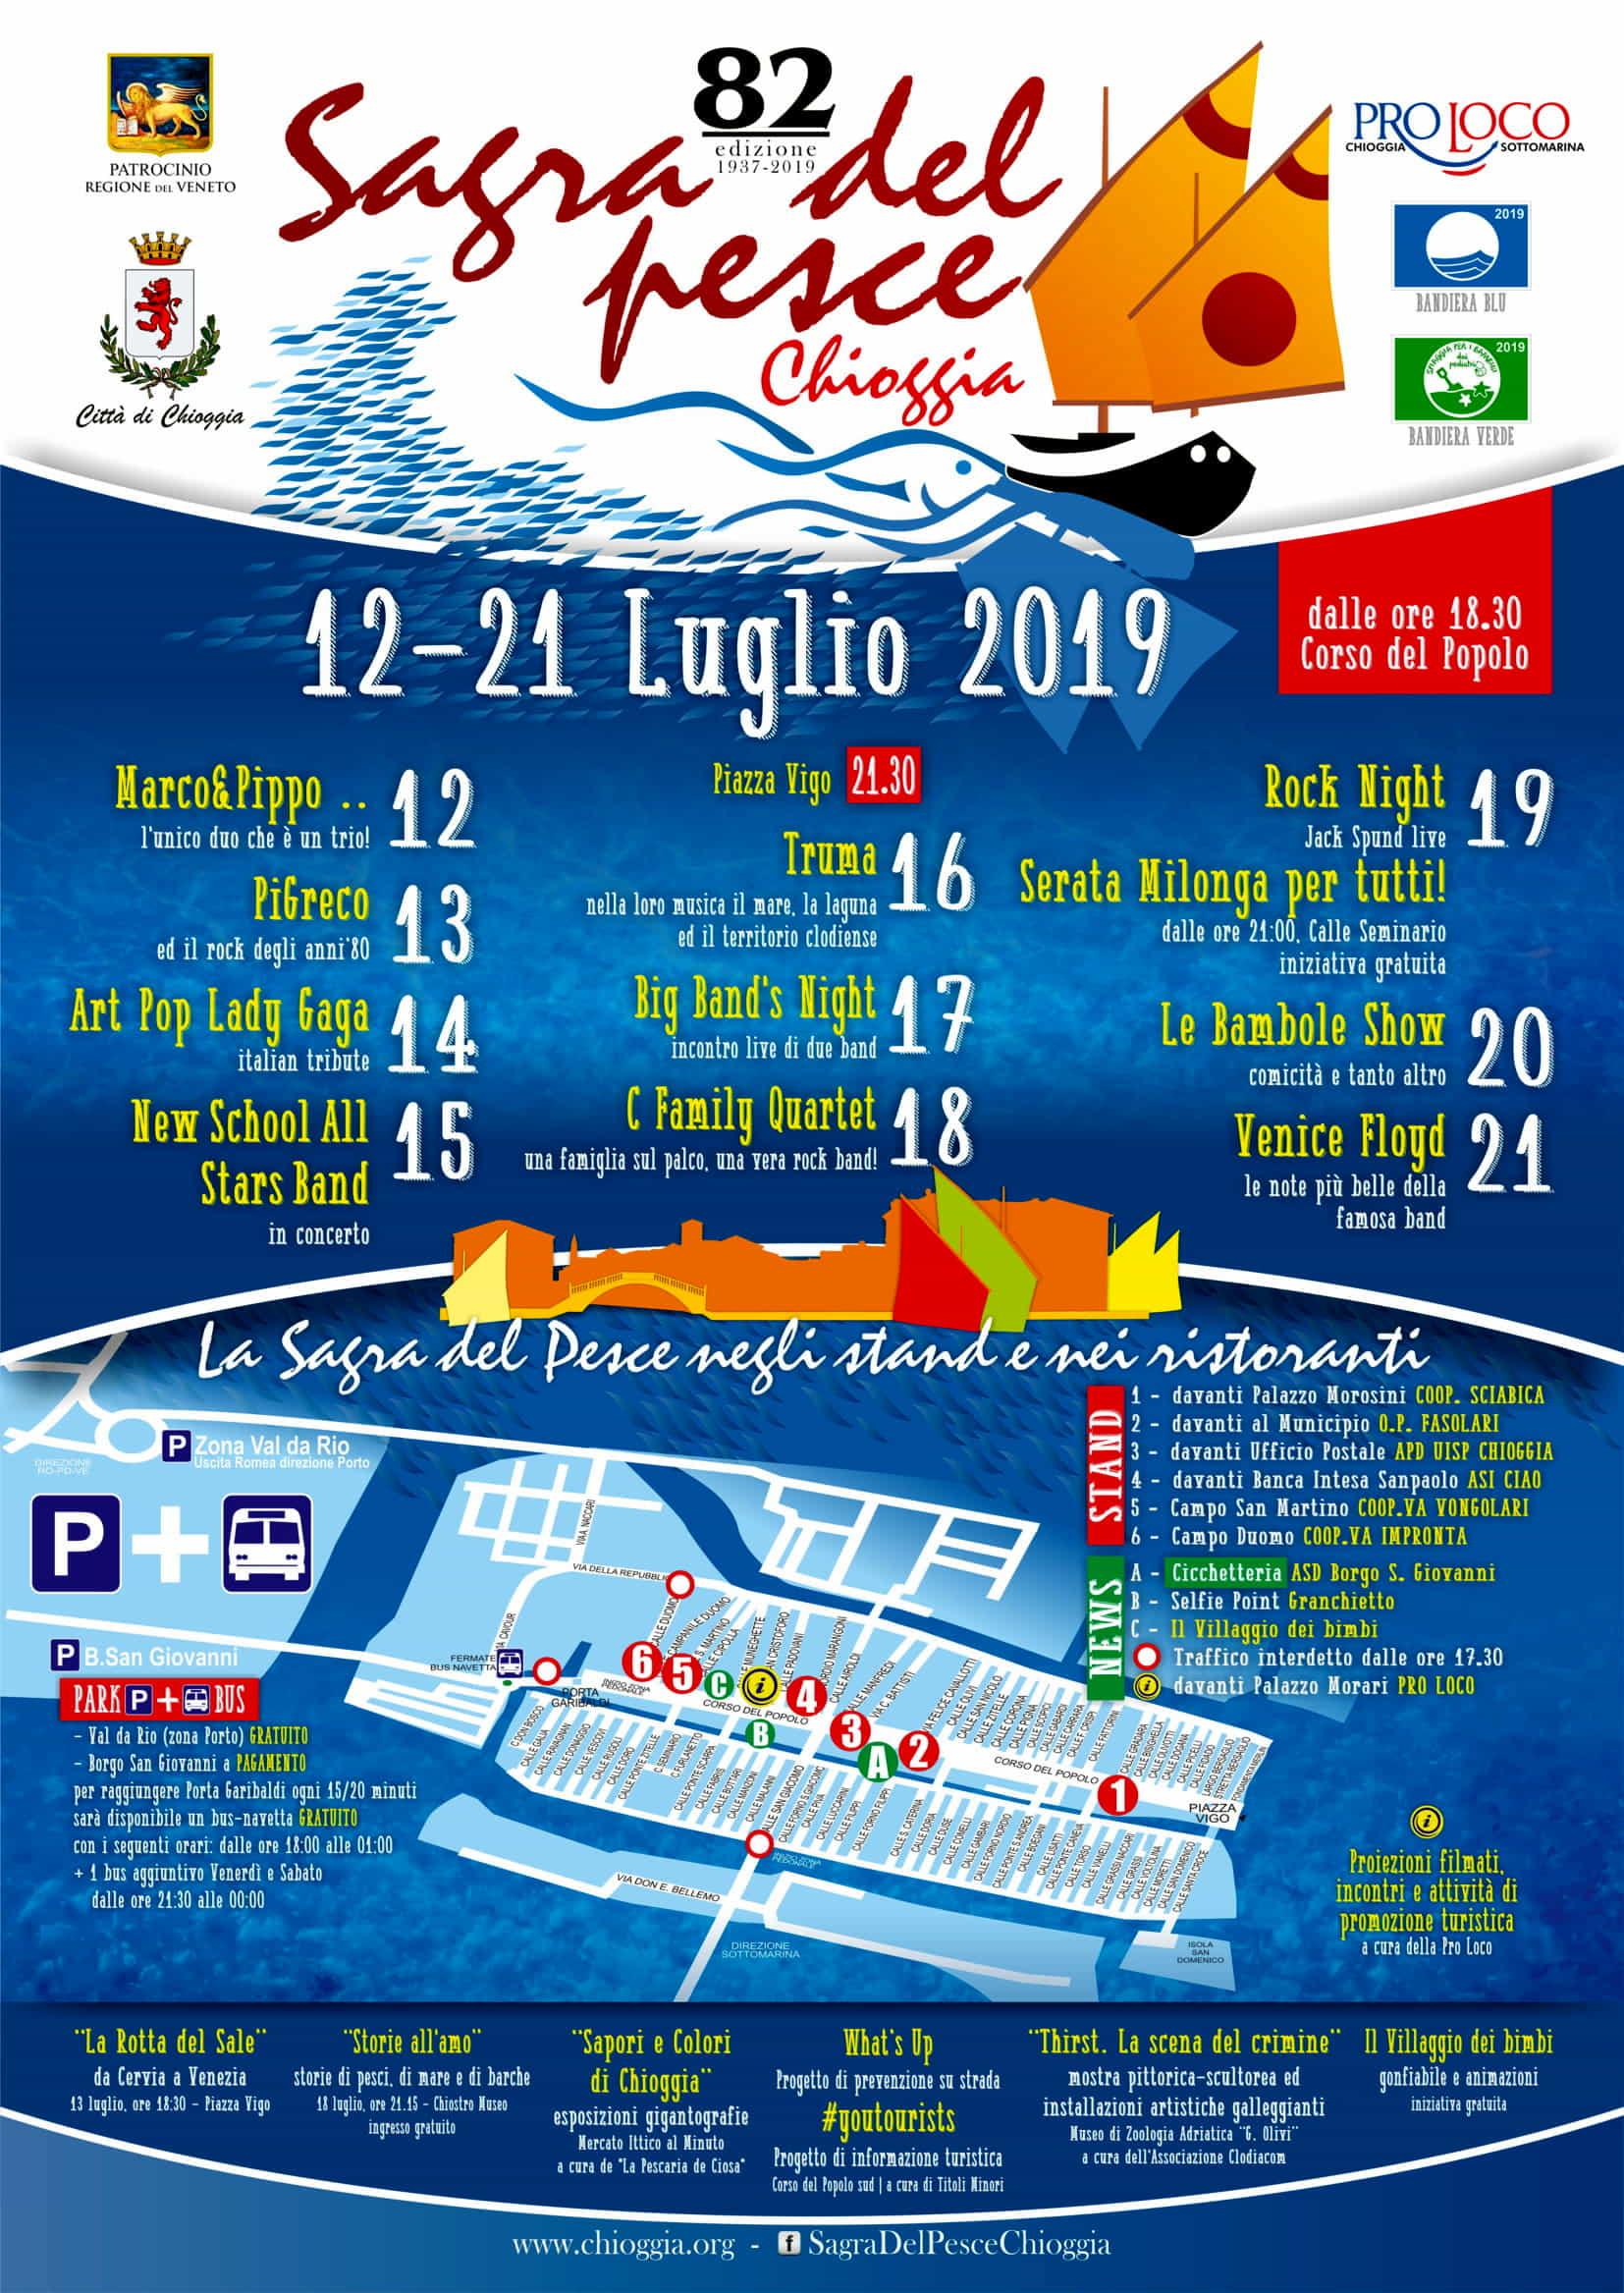 locandina Sagra del pesce 2019[34840]-4